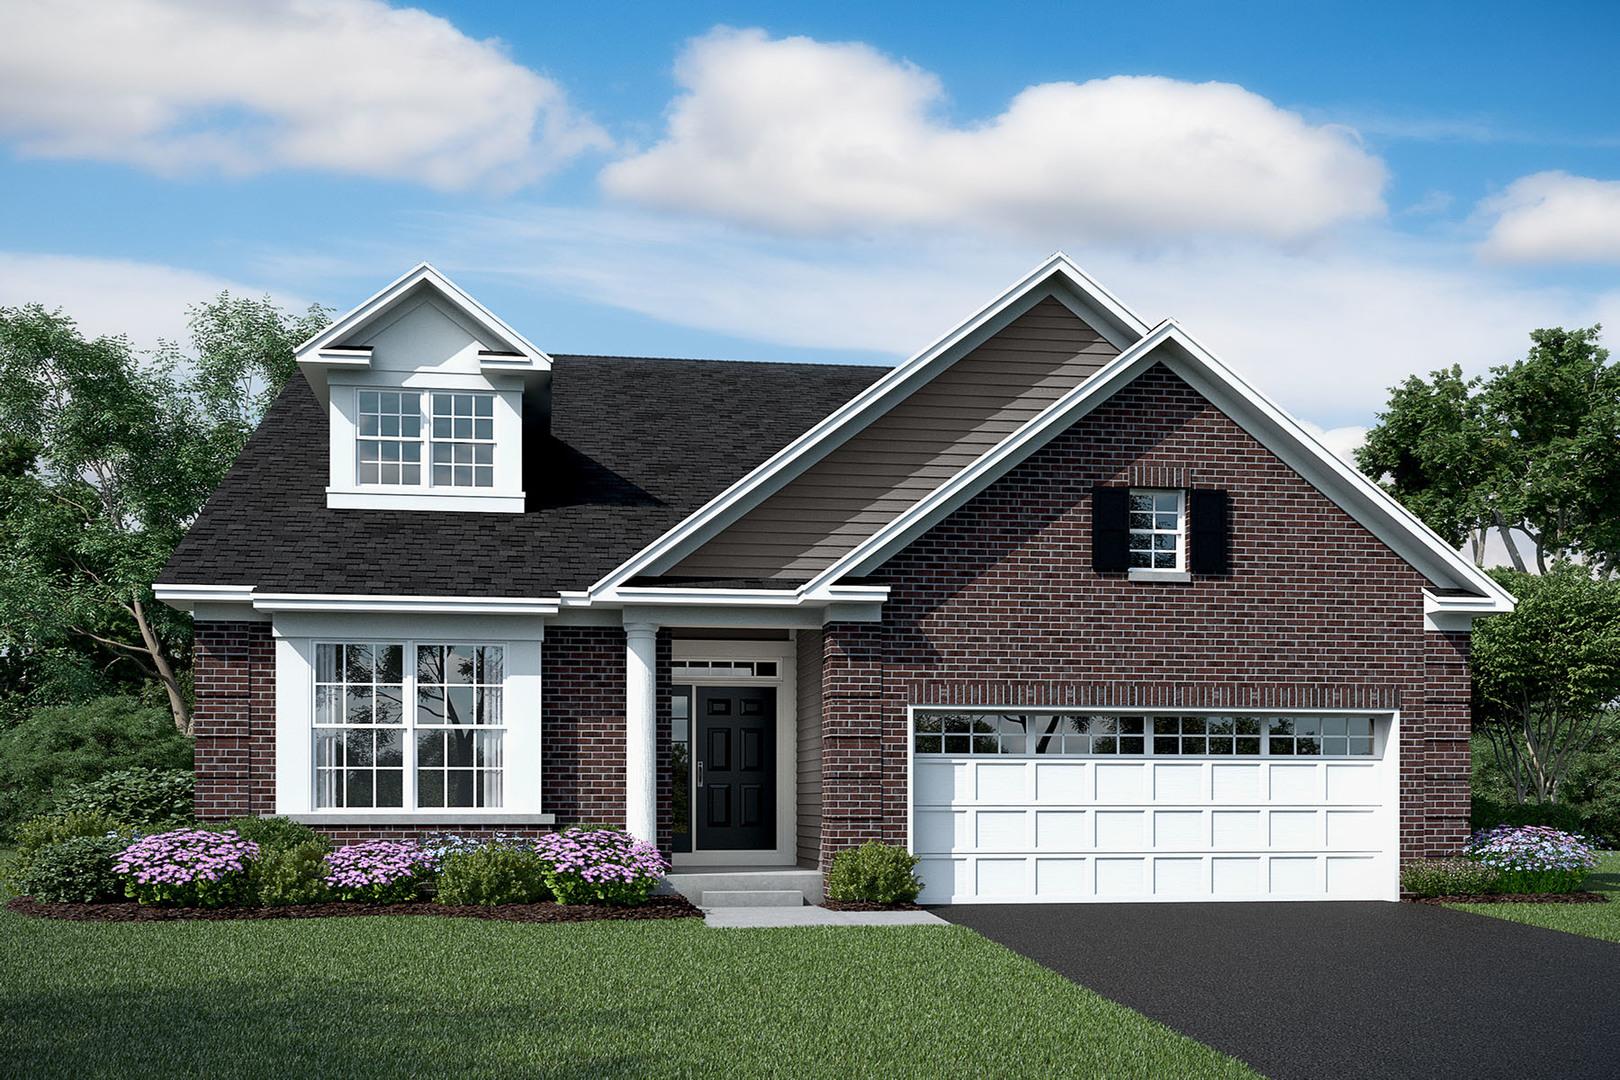 23549 N. Birkdale Lot #49 Drive, Kildeer, Il 60047